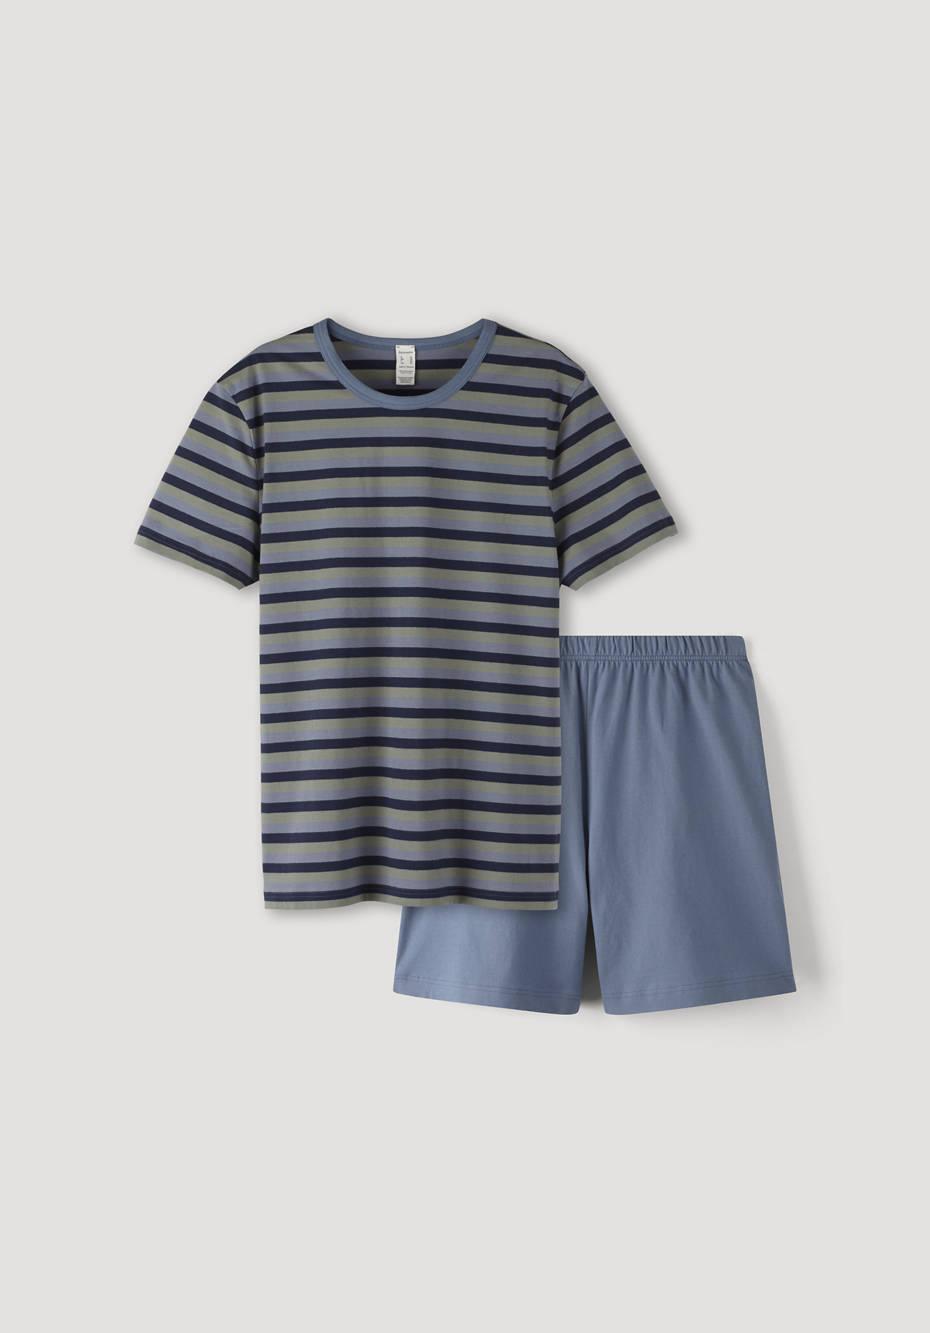 Short pajamas made from pure organic cotton